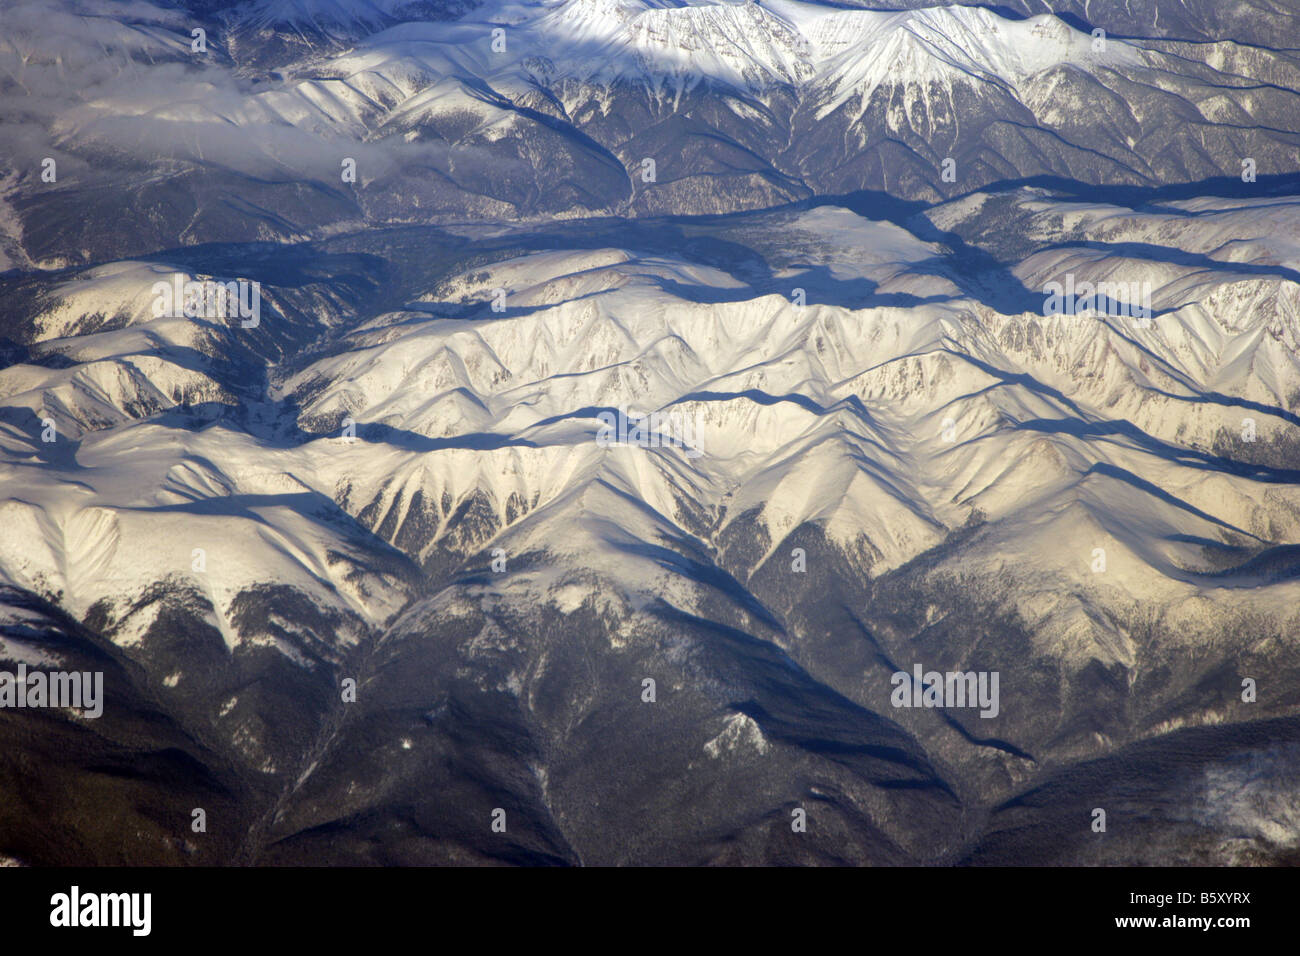 Sayan Mountains Irkutsk Mongolia seen from the air - Stock Image